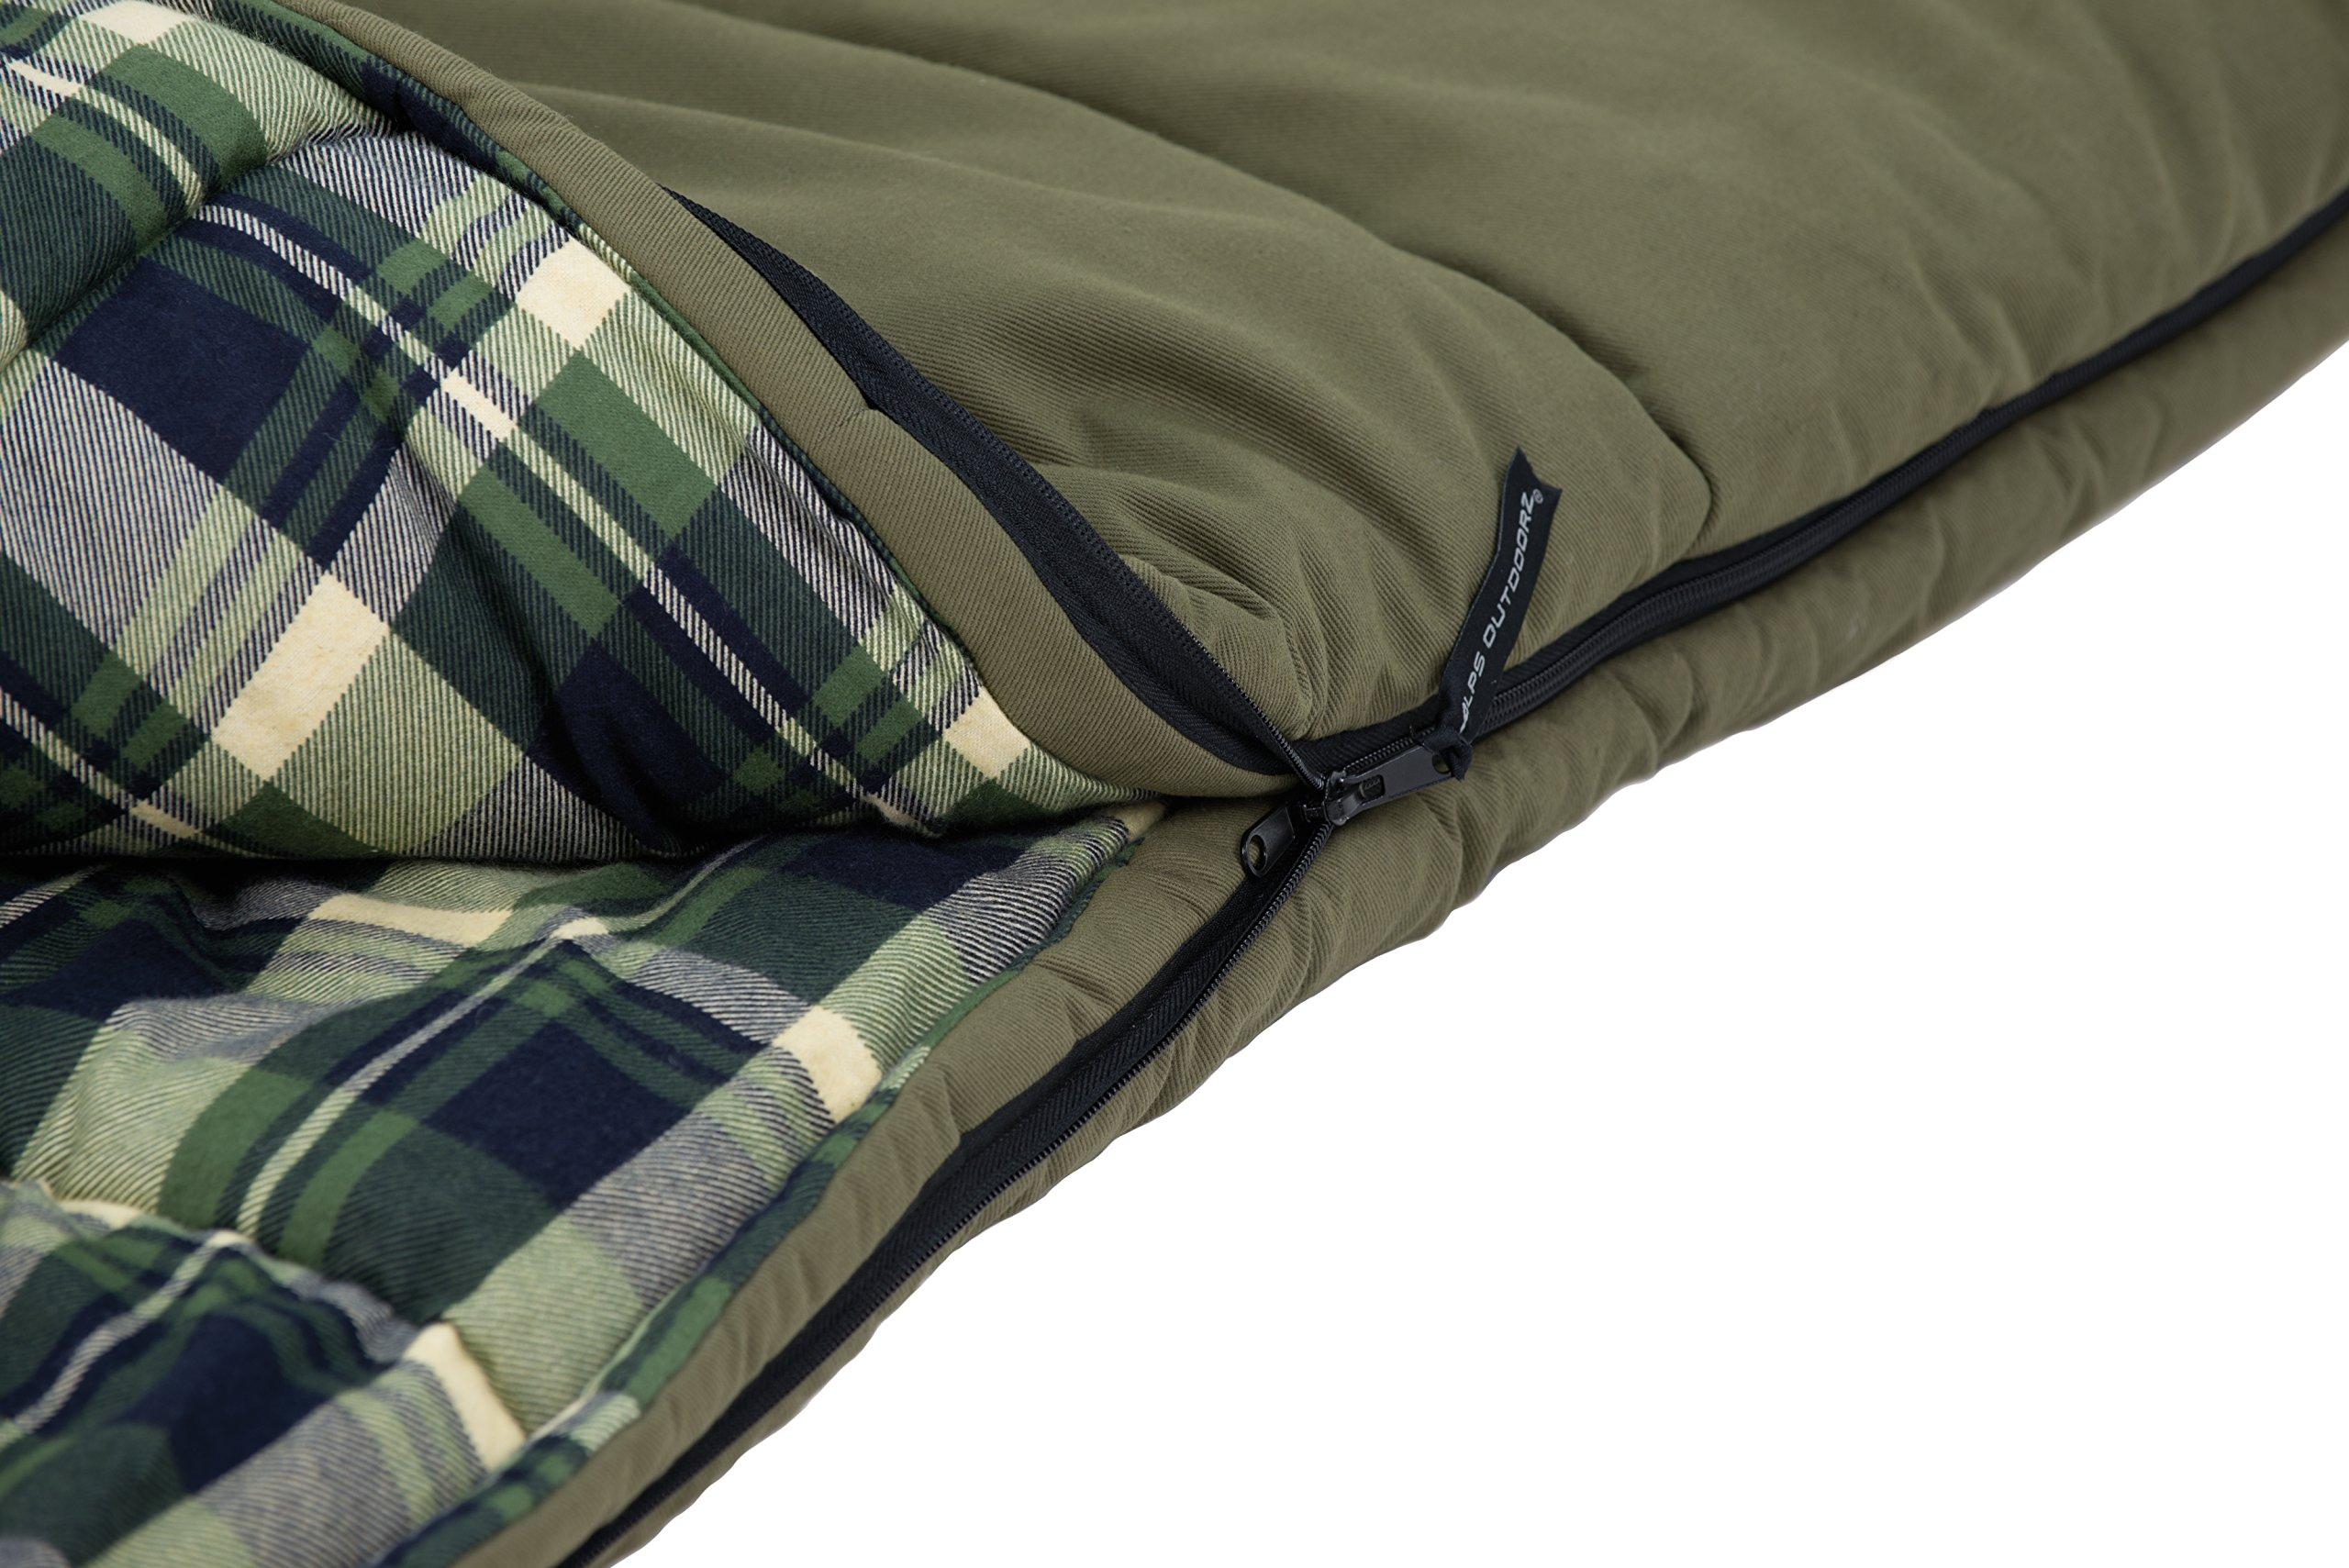 ALPS OutdoorZ Redwood -10 Degree Flannel Sleeping Bag 5